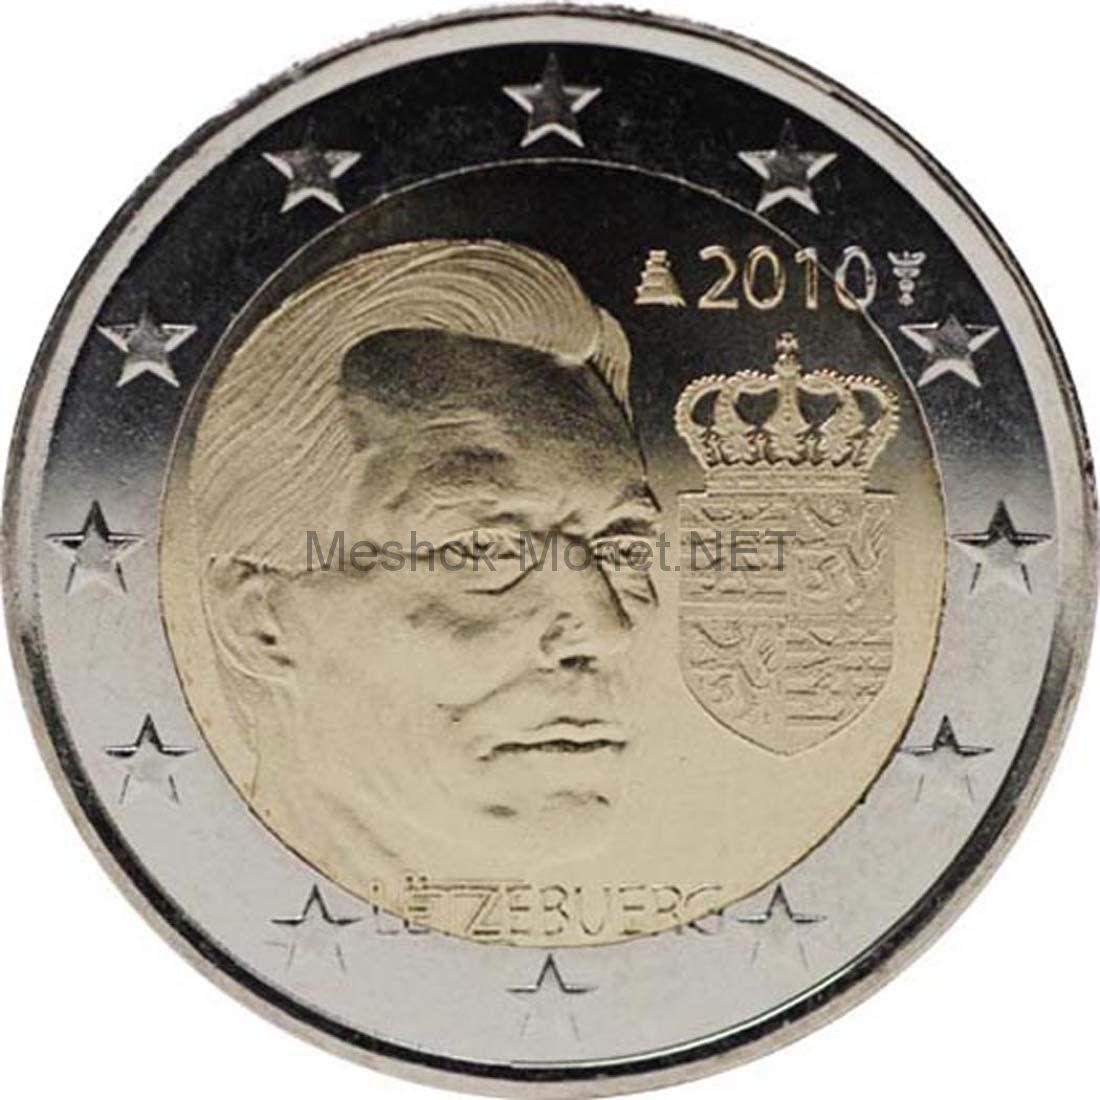 Люксембург 2 евро 2010, Герб Великого герцога Люксембурга